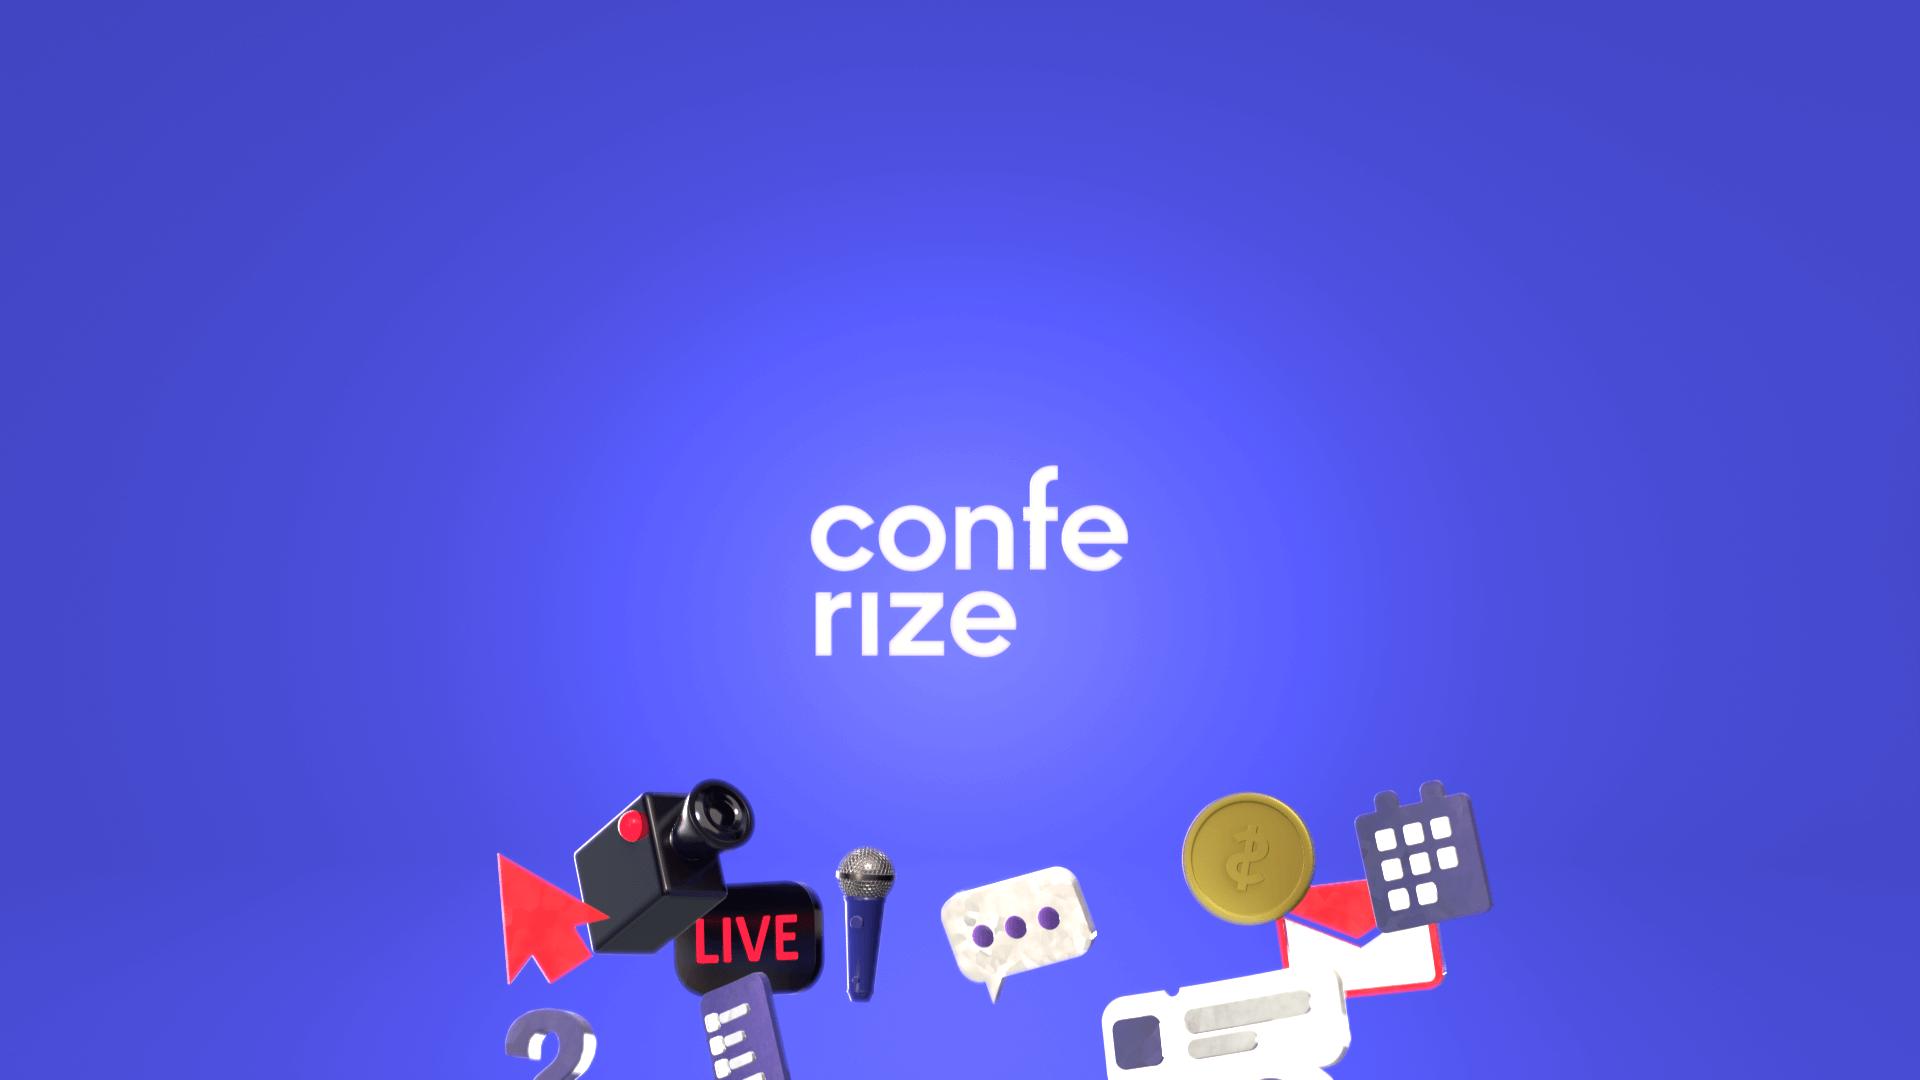 Conferize - Introduction video